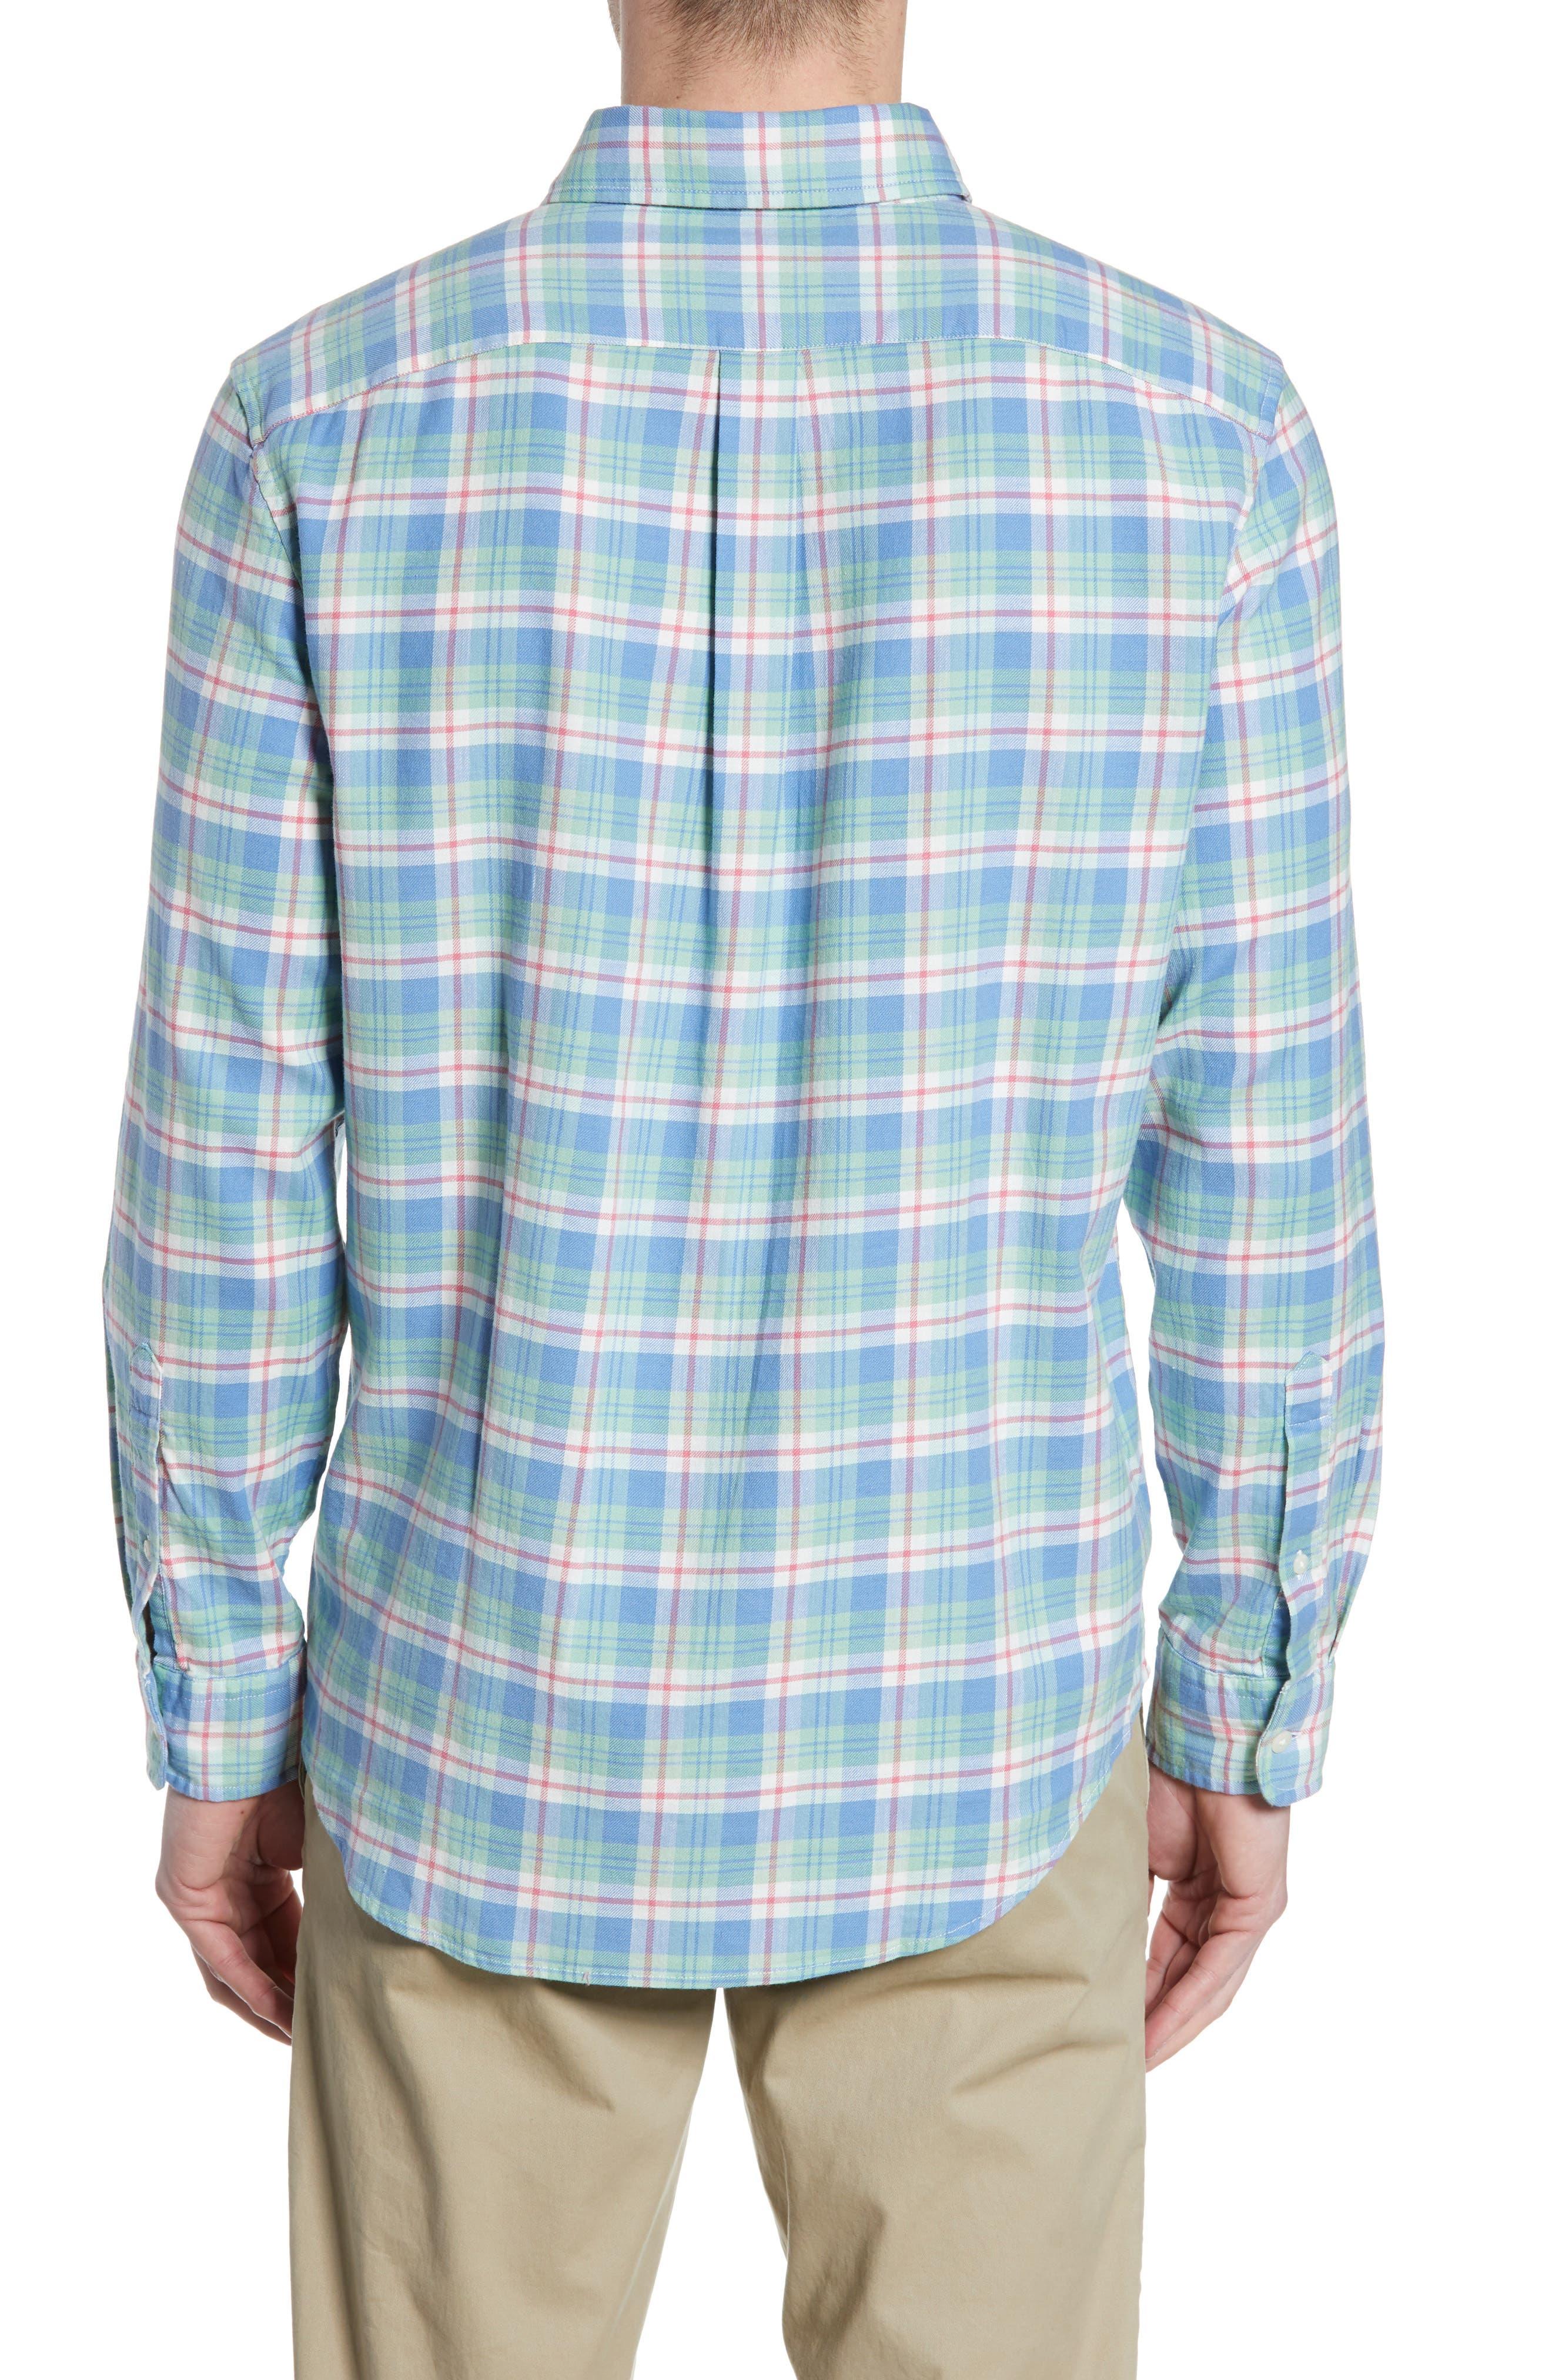 VINEYARD VINES,                             Murray Slim Fit Twill Sport Shirt,                             Alternate thumbnail 3, color,                             SEA KELP